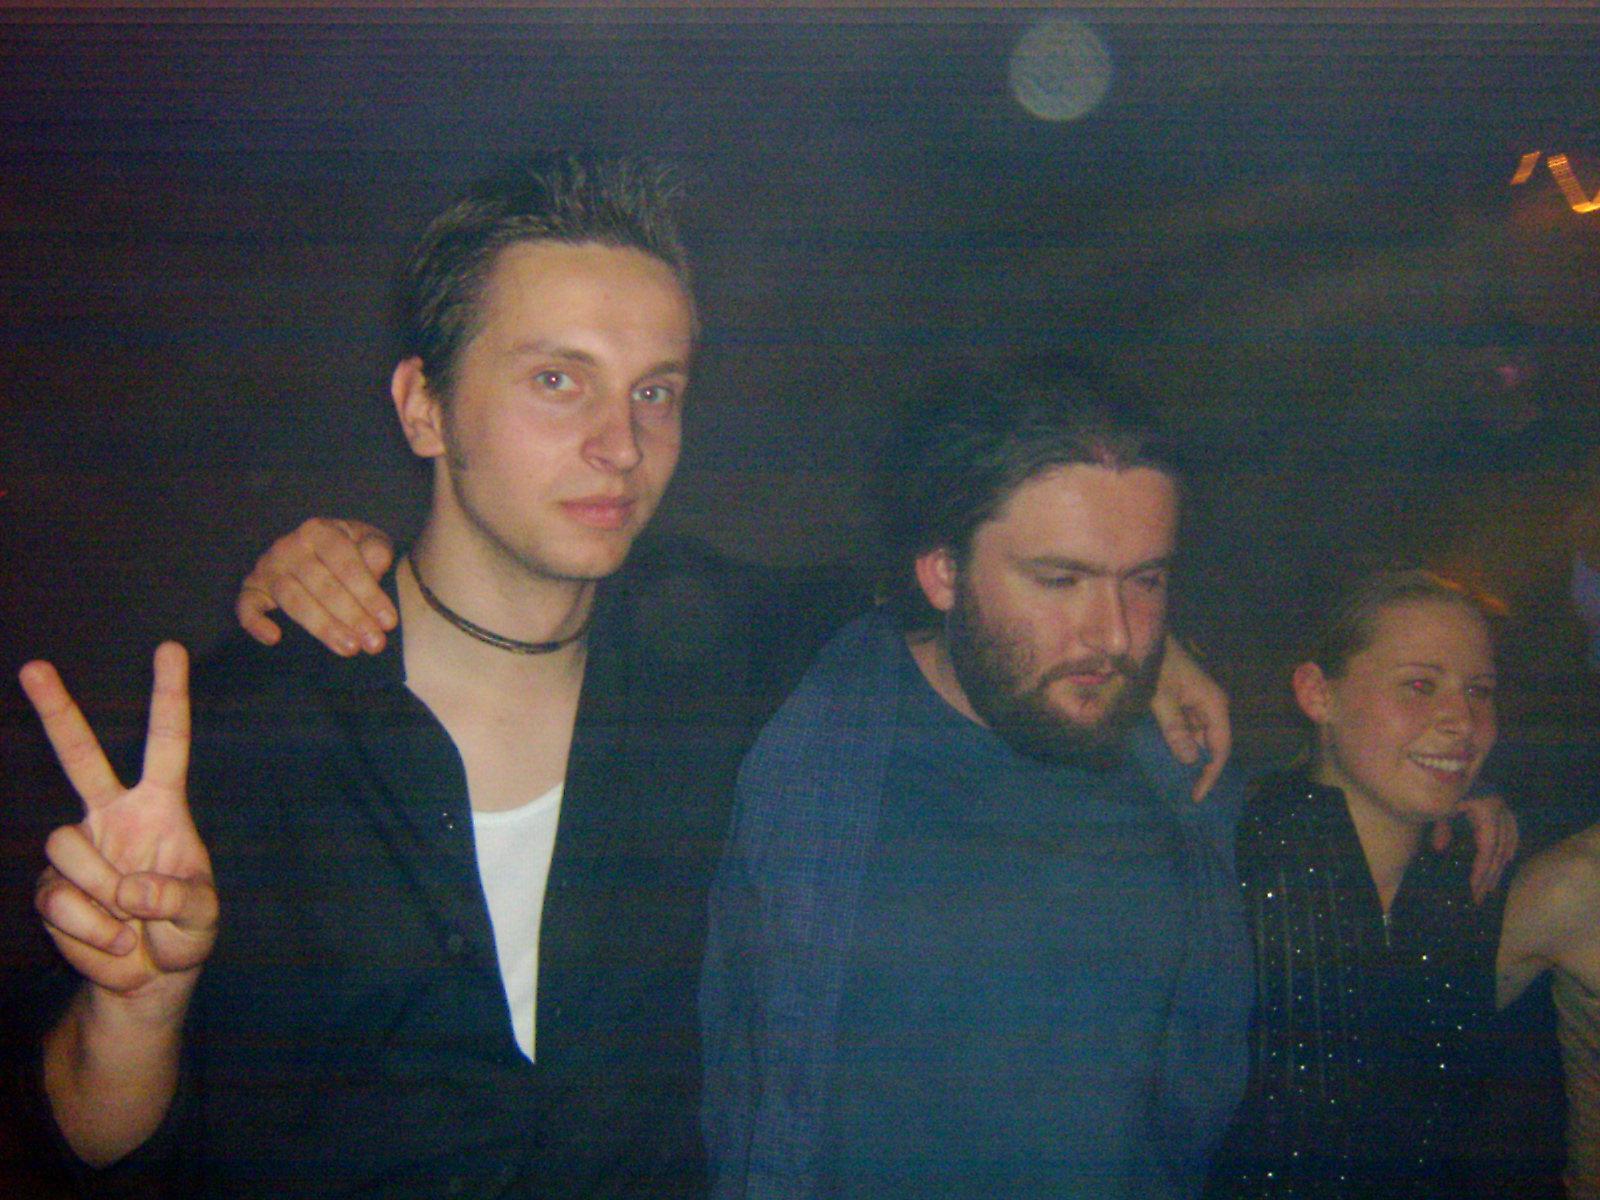 2004.05.28 Depeche Mode Party